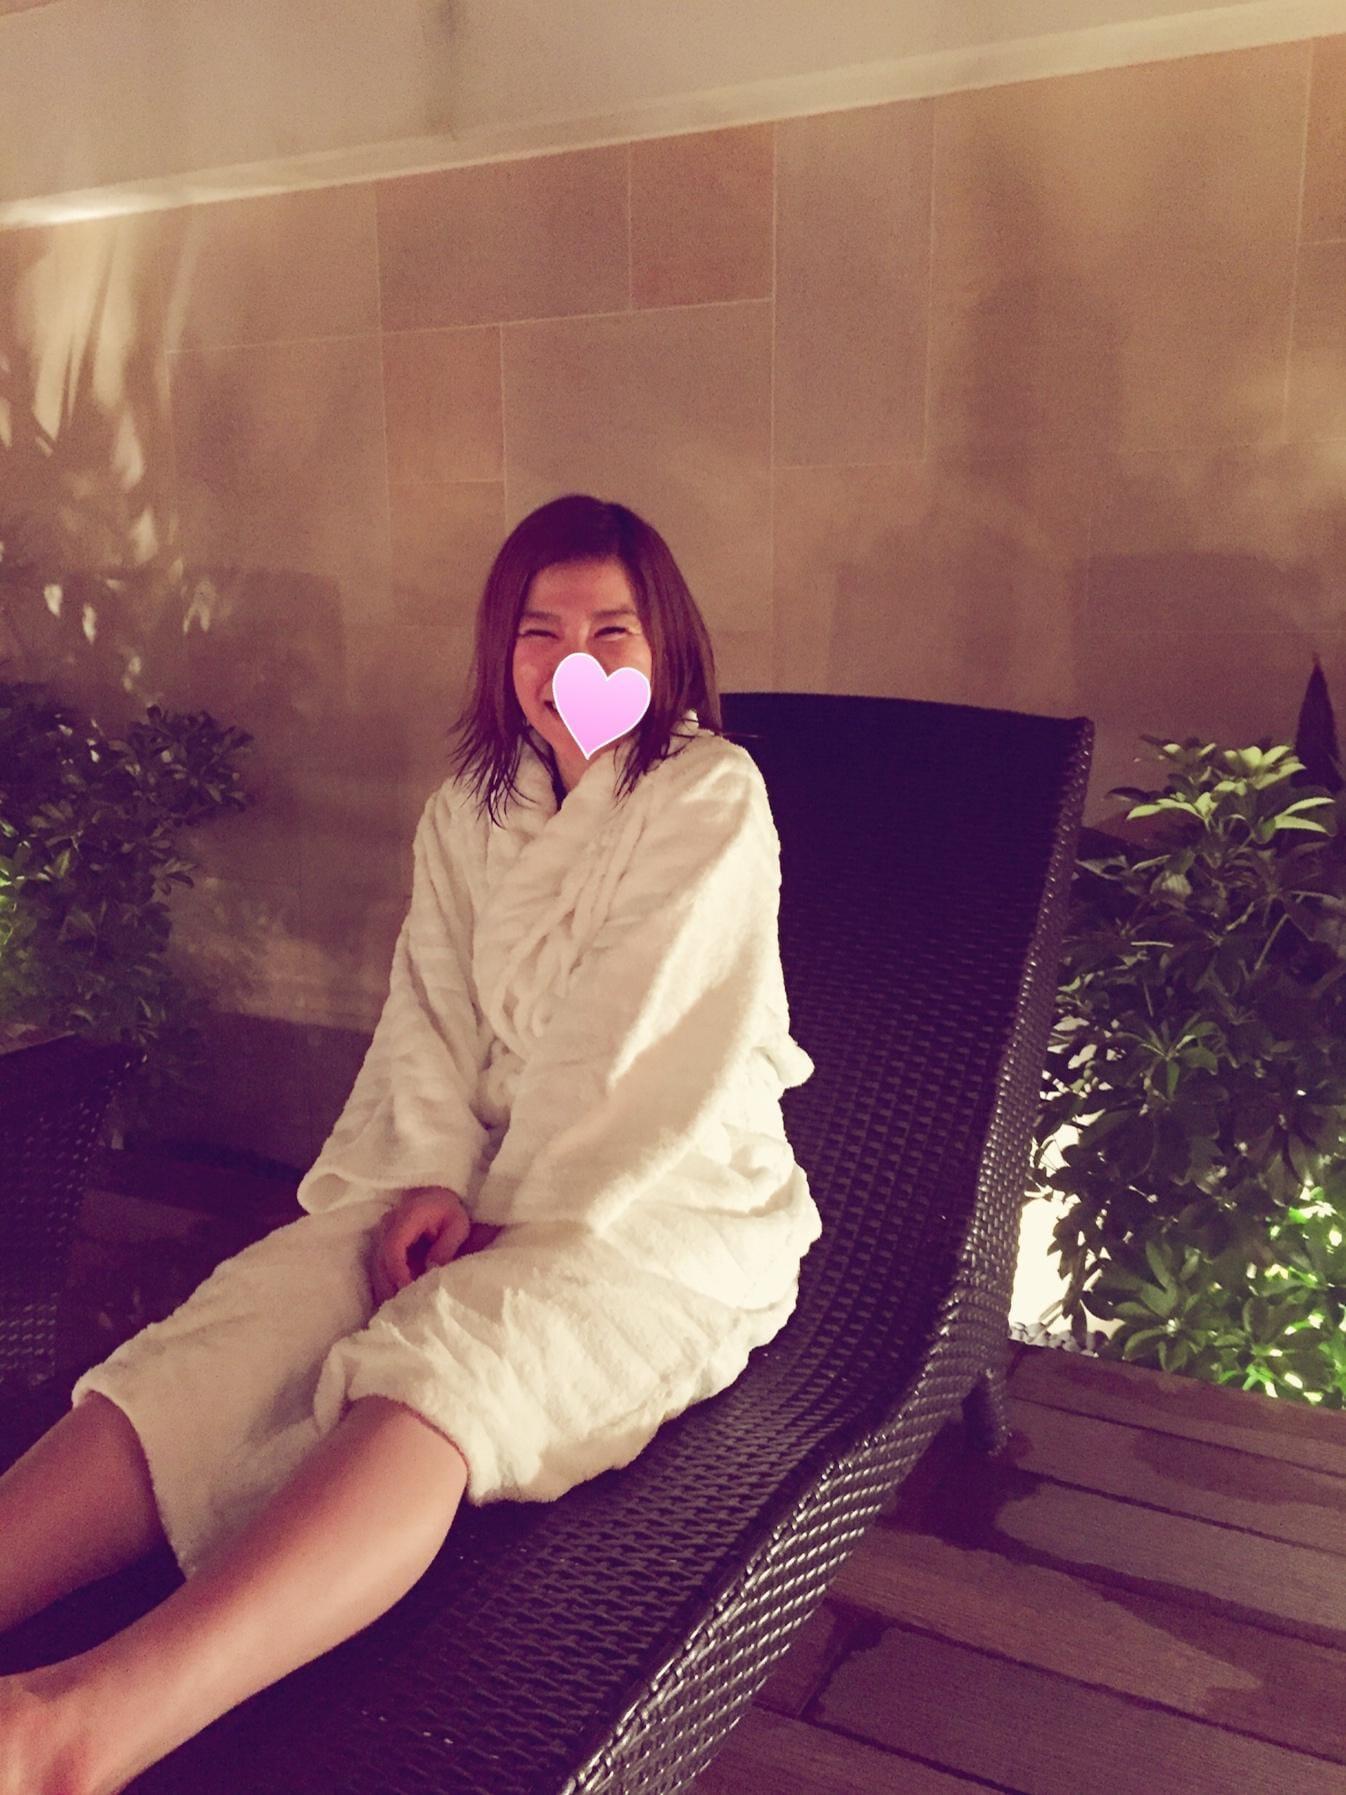 CHIE「4日目★ありがとう」06/24(日) 05:42   CHIEの写メ・風俗動画